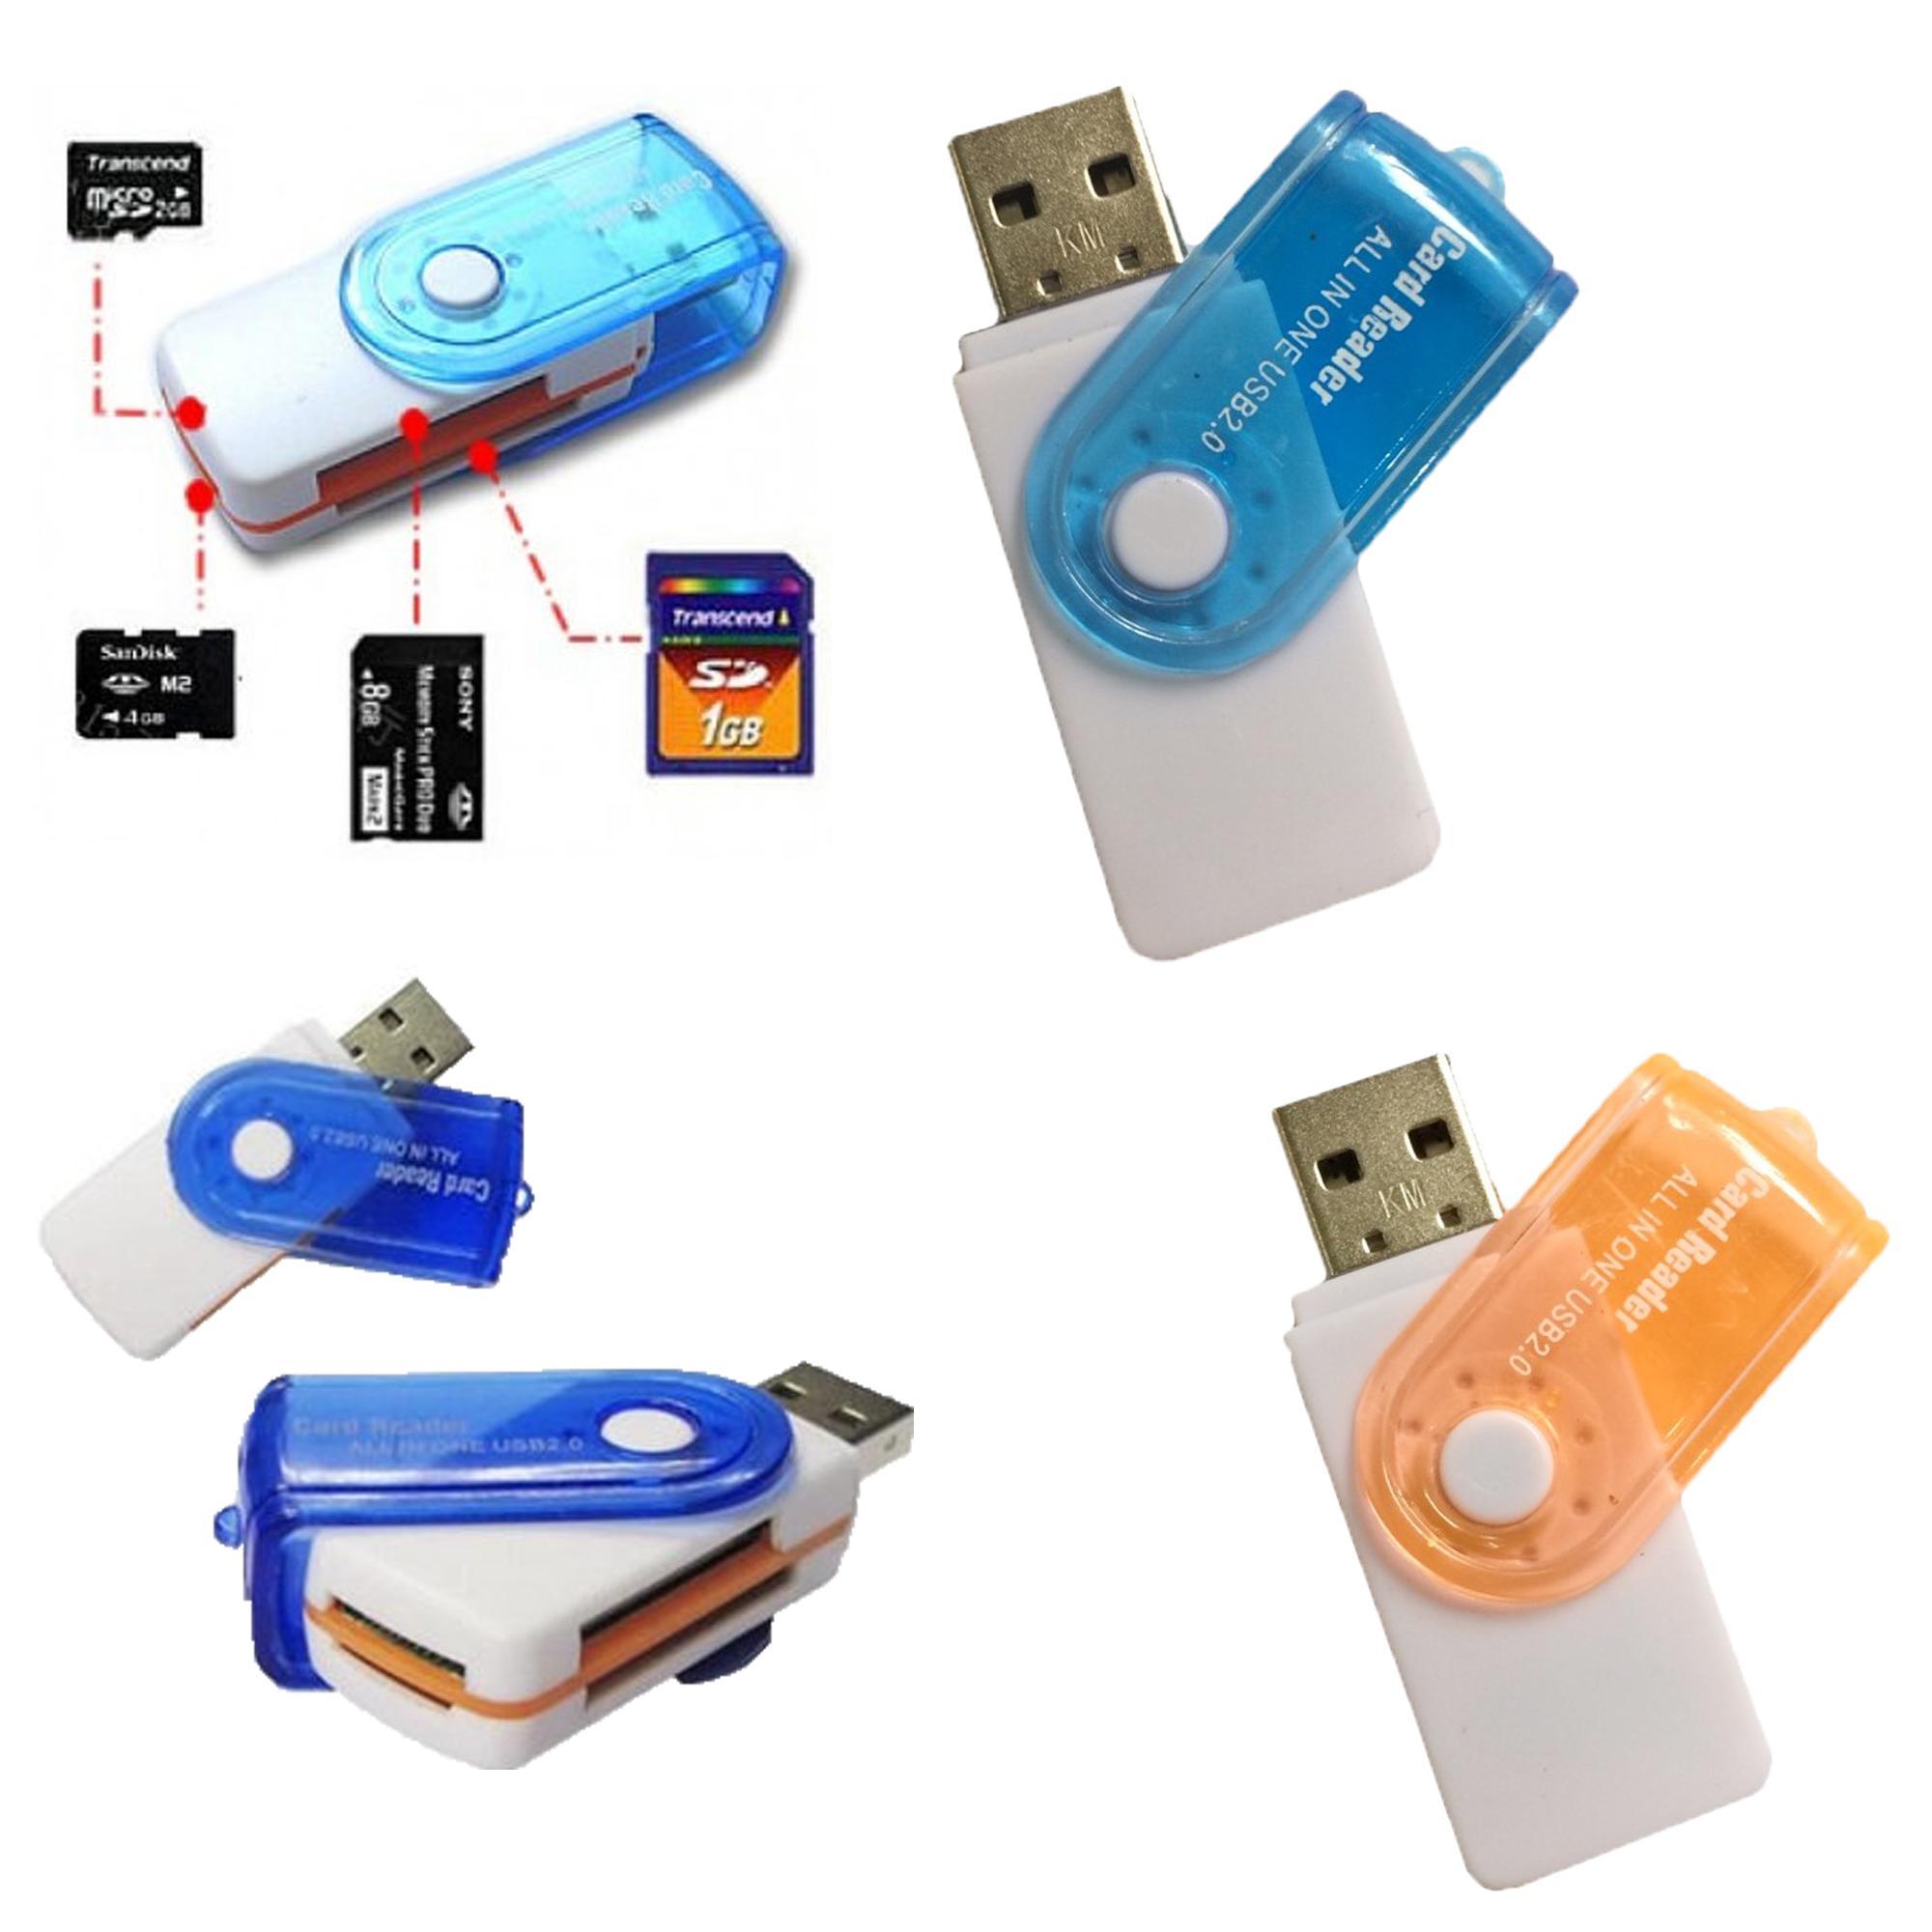 CARD READER MINI MICRO SD USB2.0  قارئة ذواكر ,Card